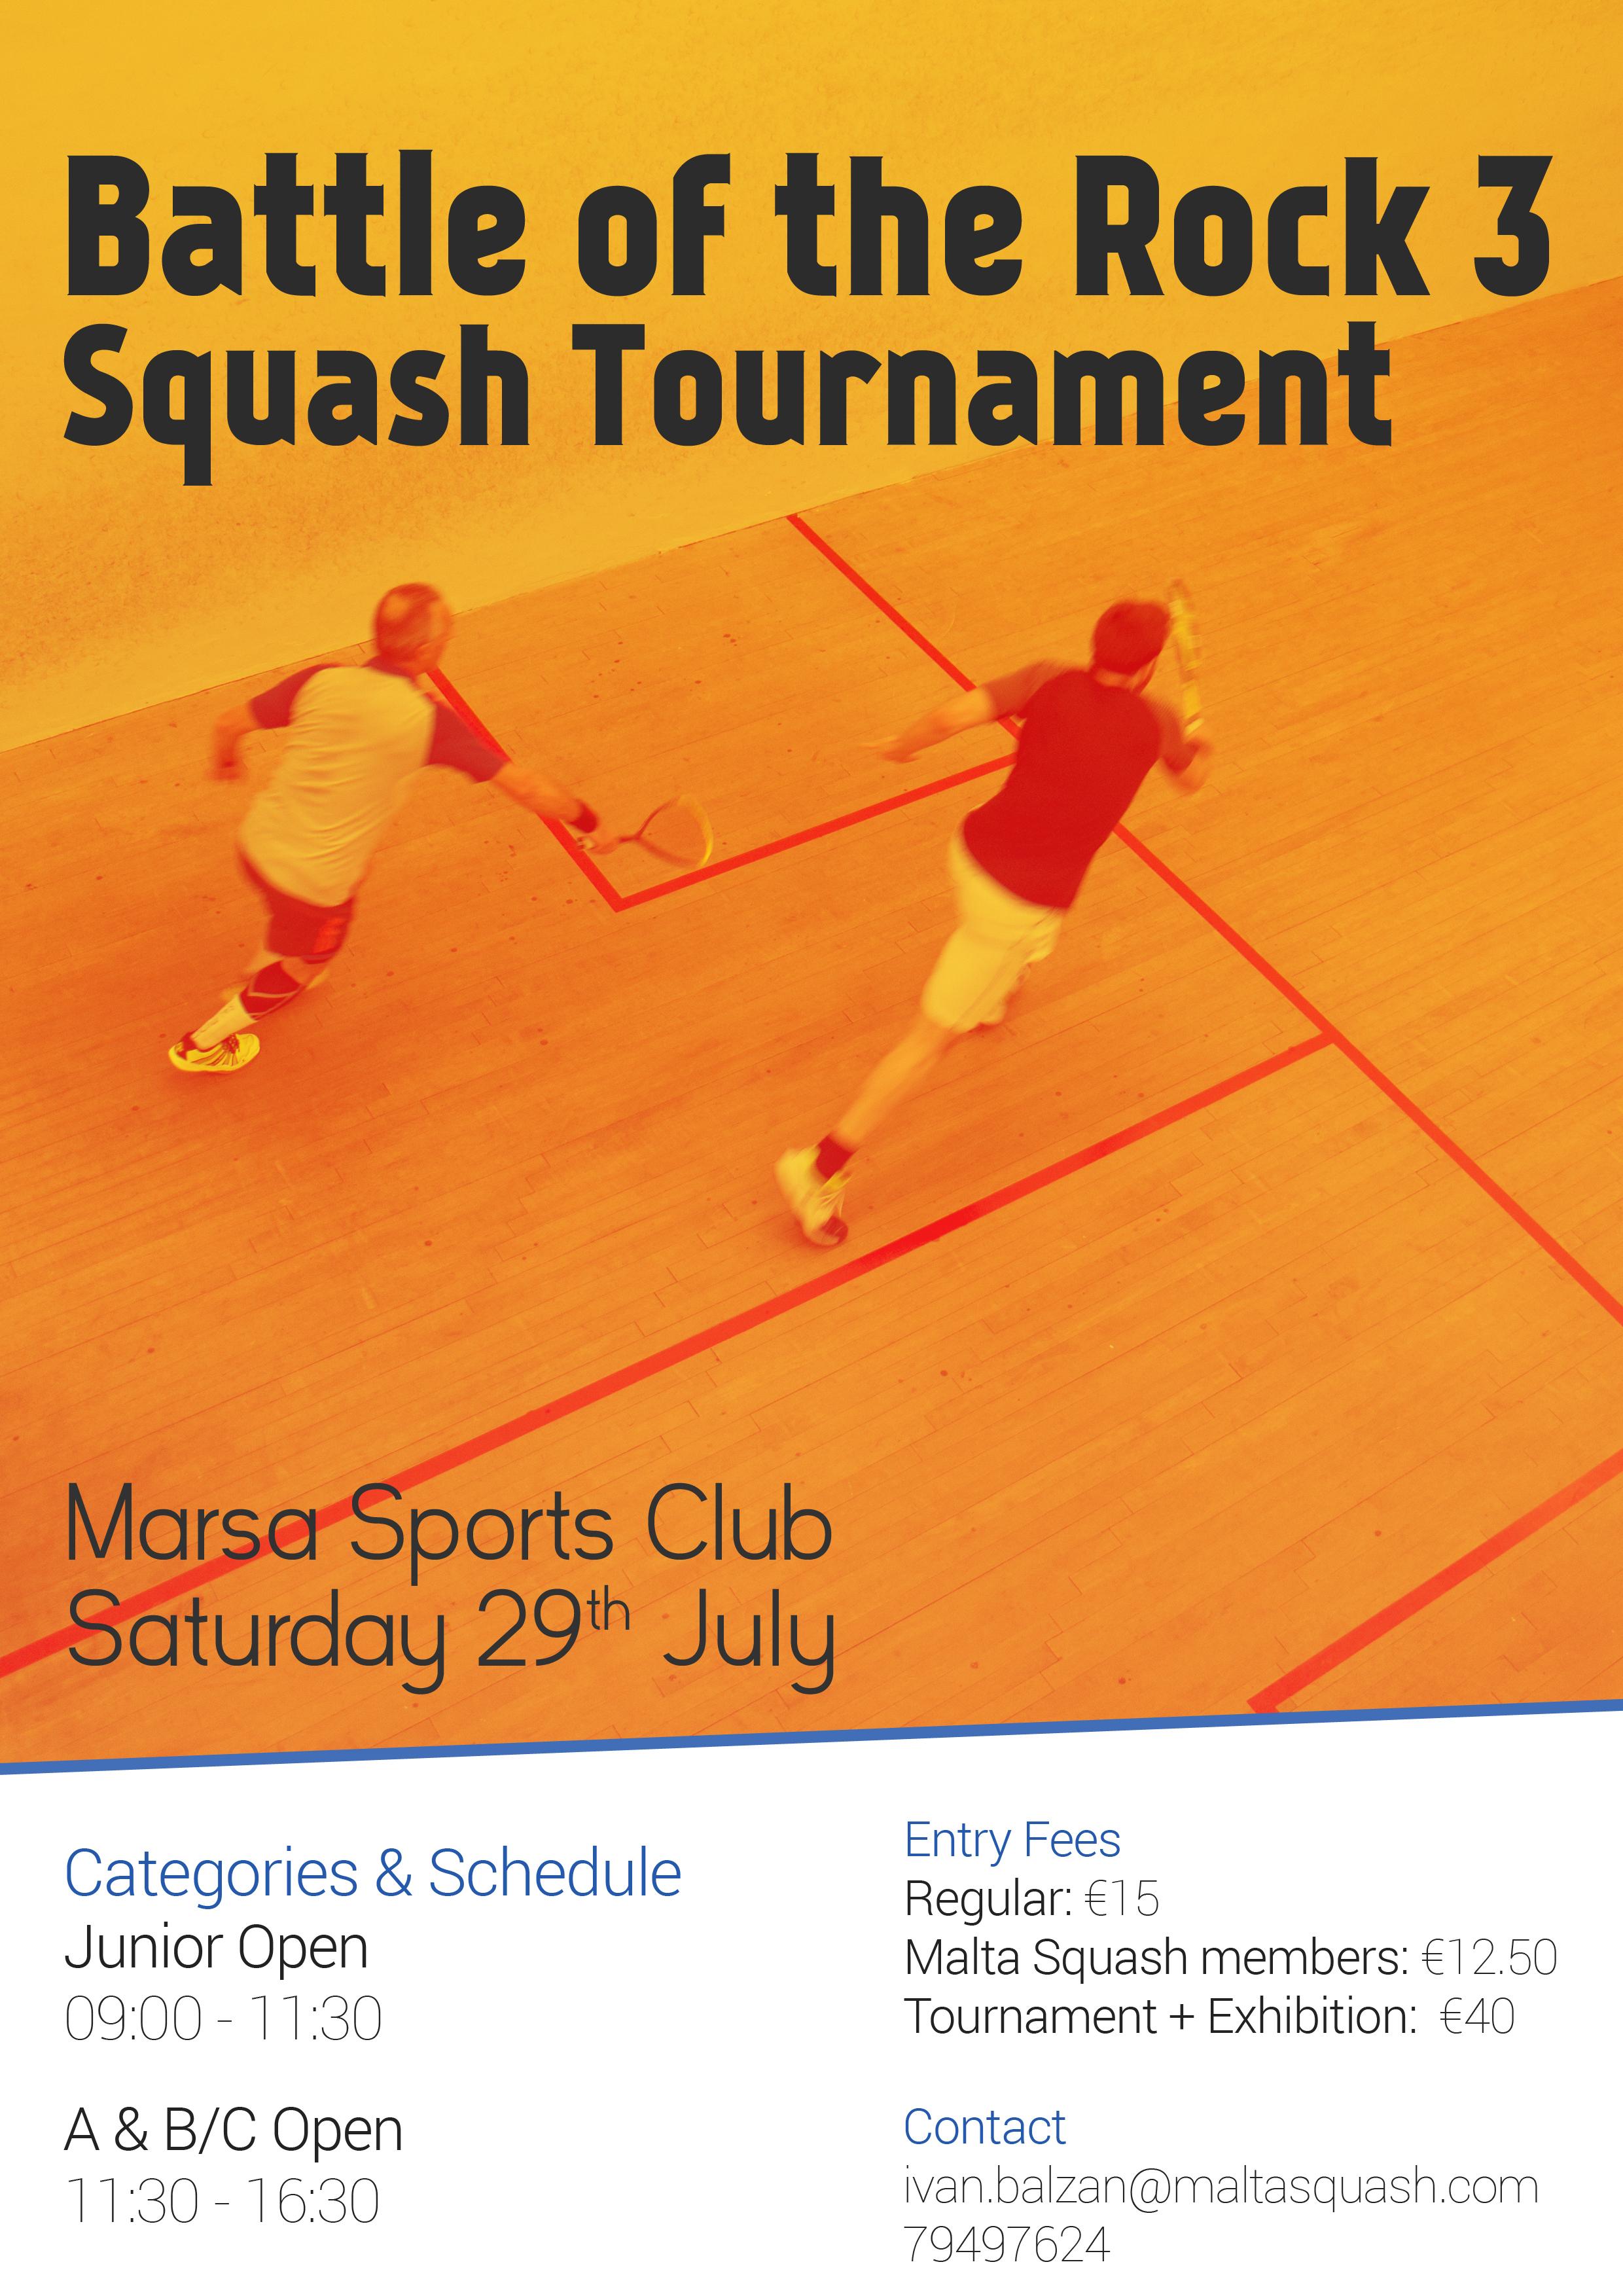 Malta Squash Association